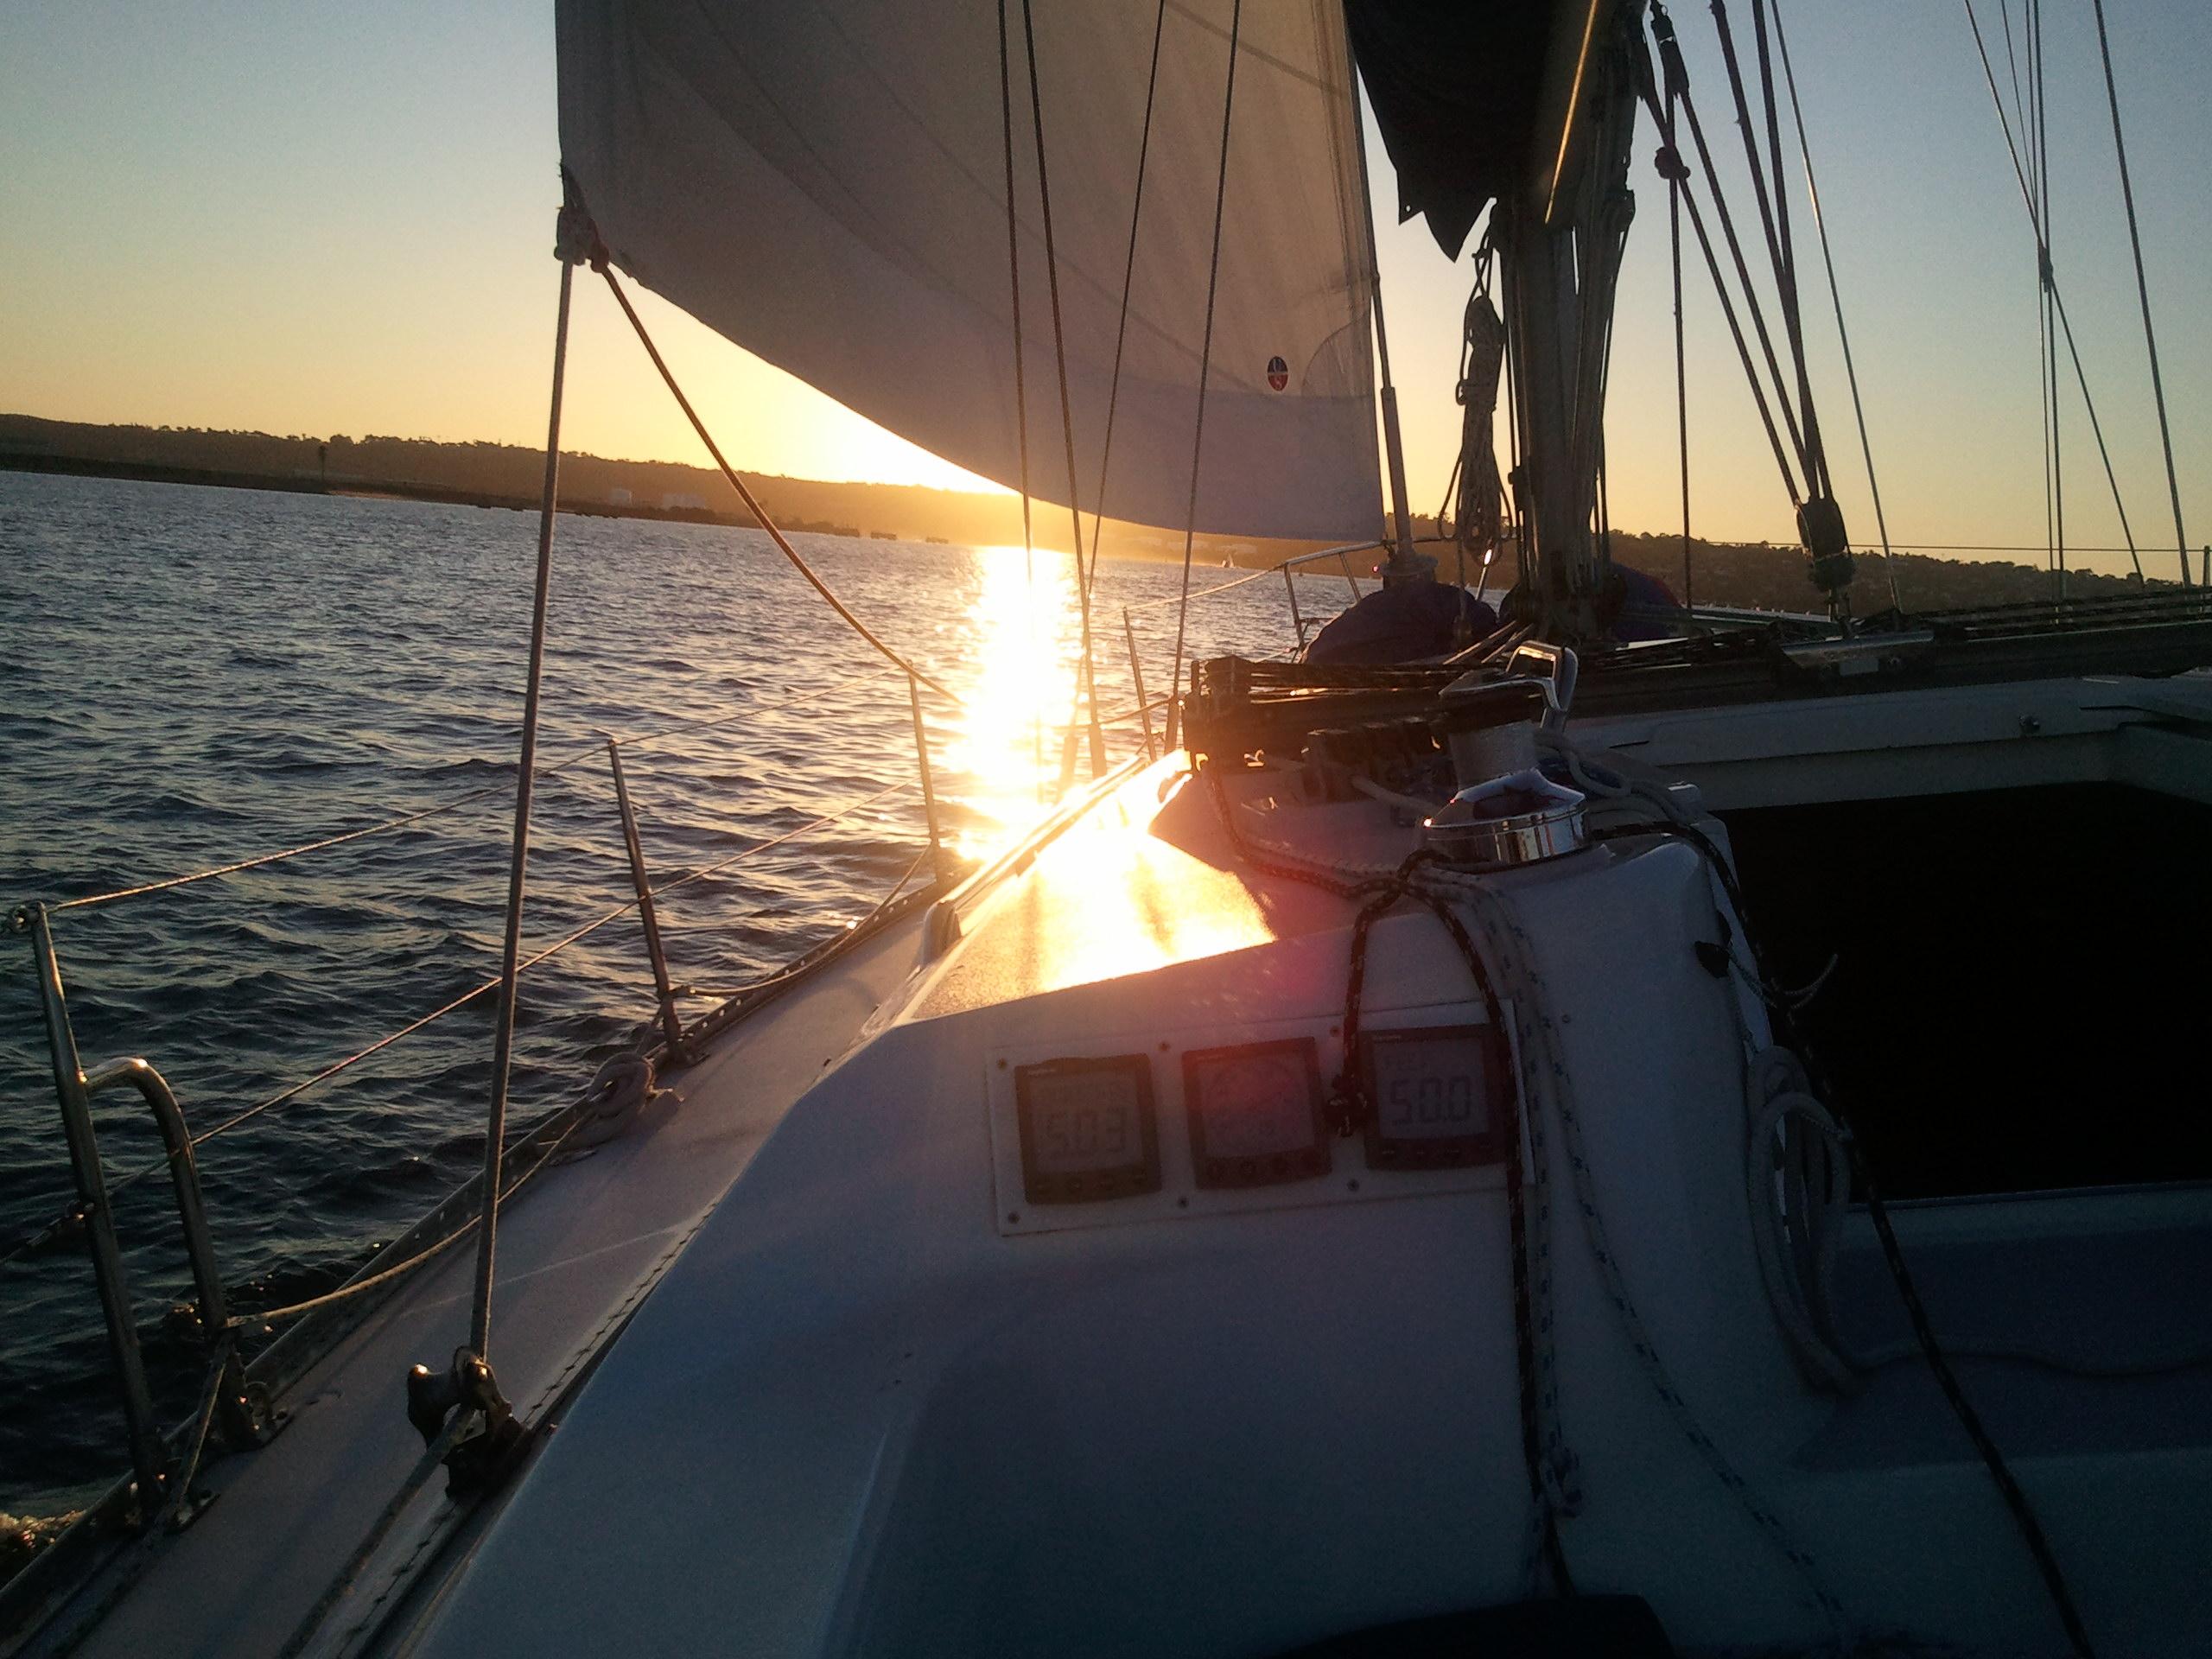 THE FLEET - Sail San Diego ~ San Diego's #1 Choice for Sailing Tours!Sail San Diego ~ San Diego's #1 Choice for Sailing Tours!